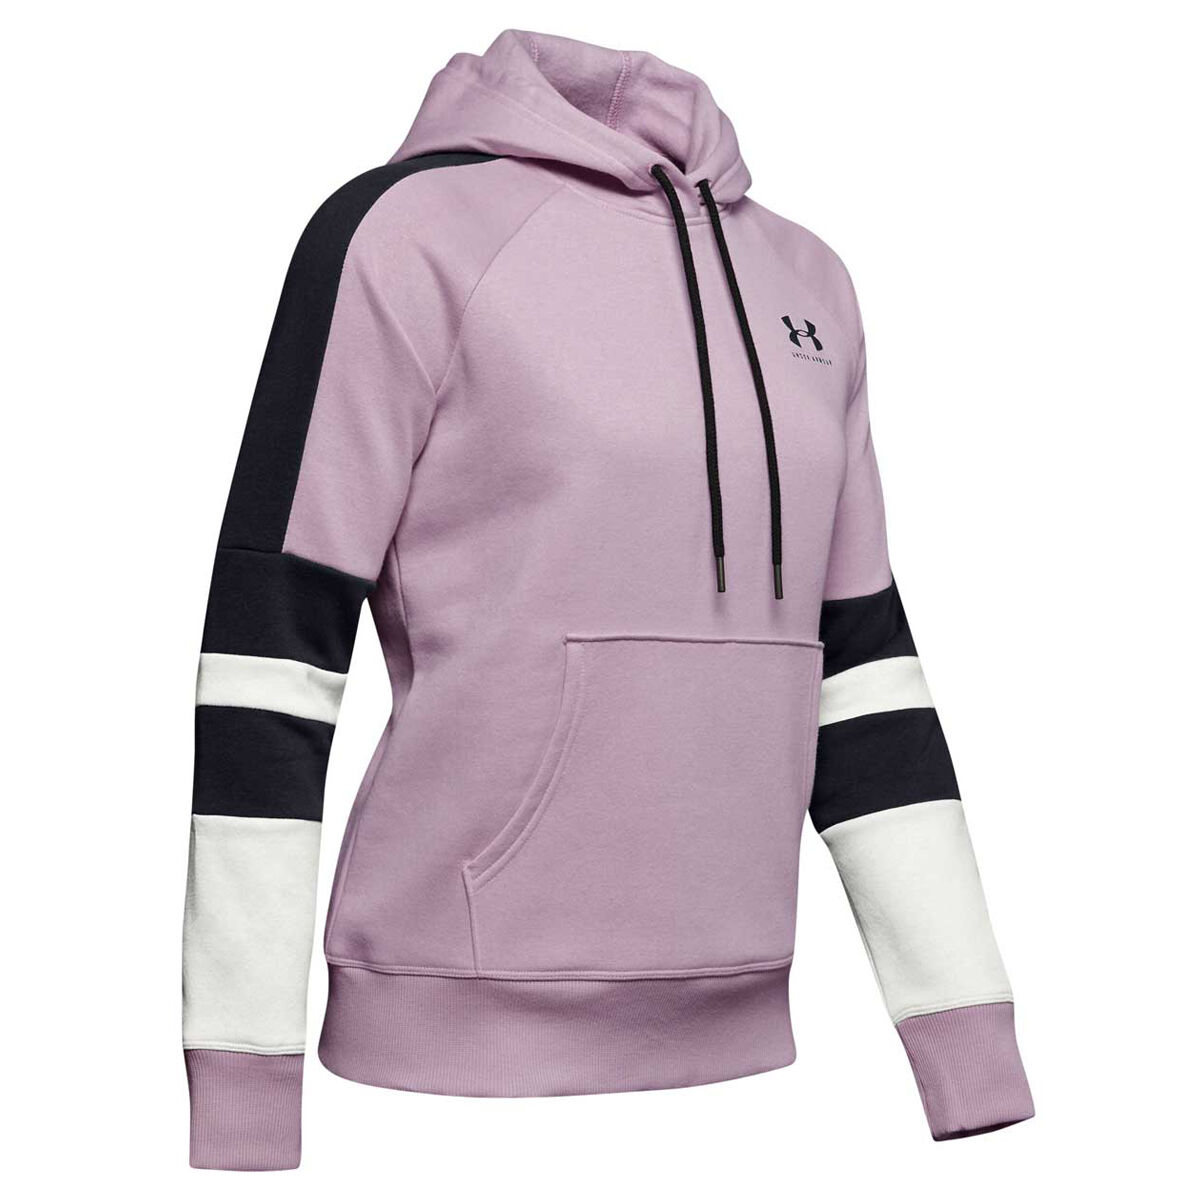 Details about New adidas Ultimate Full Zip Hoodie Sports Fleece Jacket Purple Women's L LG